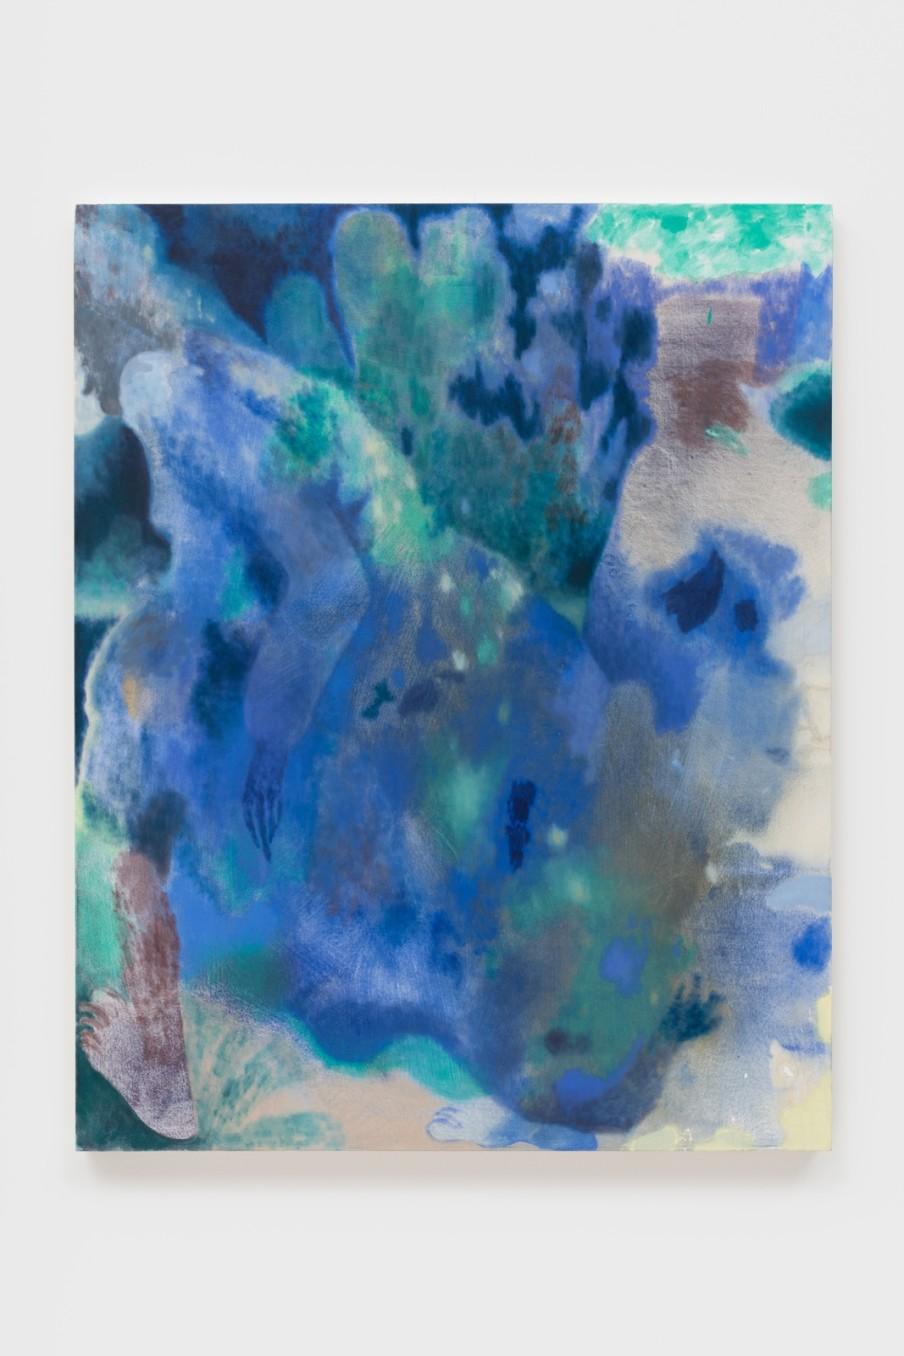 Maja Ruznic Odlazak II, 2020 Acrylic and oil on canvas 152.4 x 121.9 cm 60 x 48 in Inquire